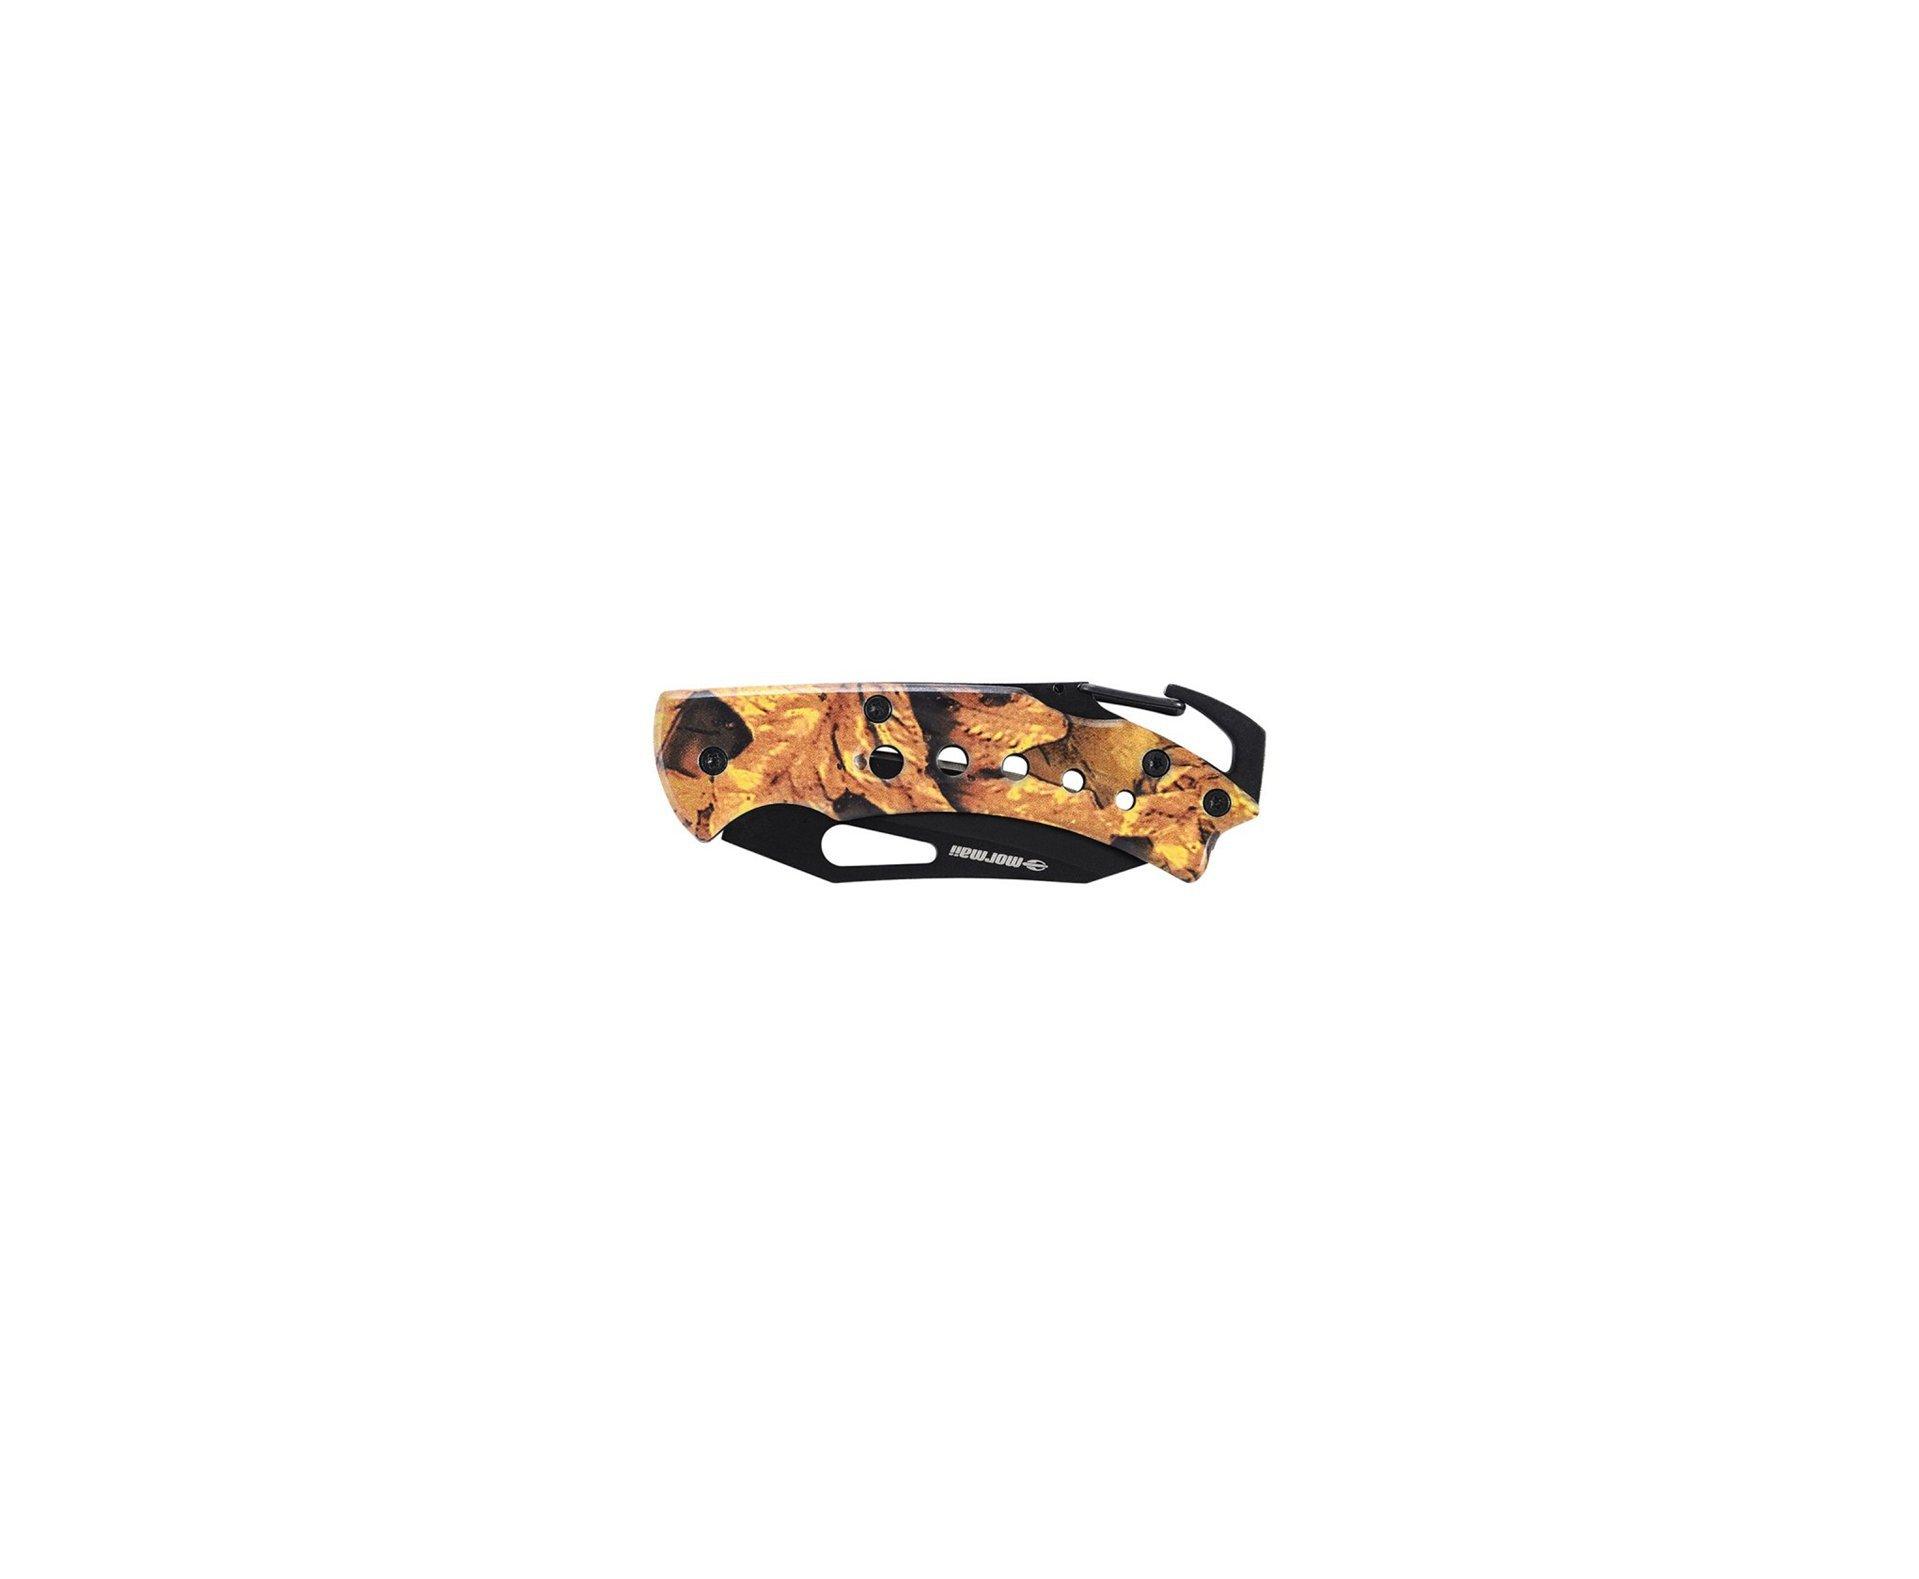 Canivete Nano Savage Aço 420 - Mormaii